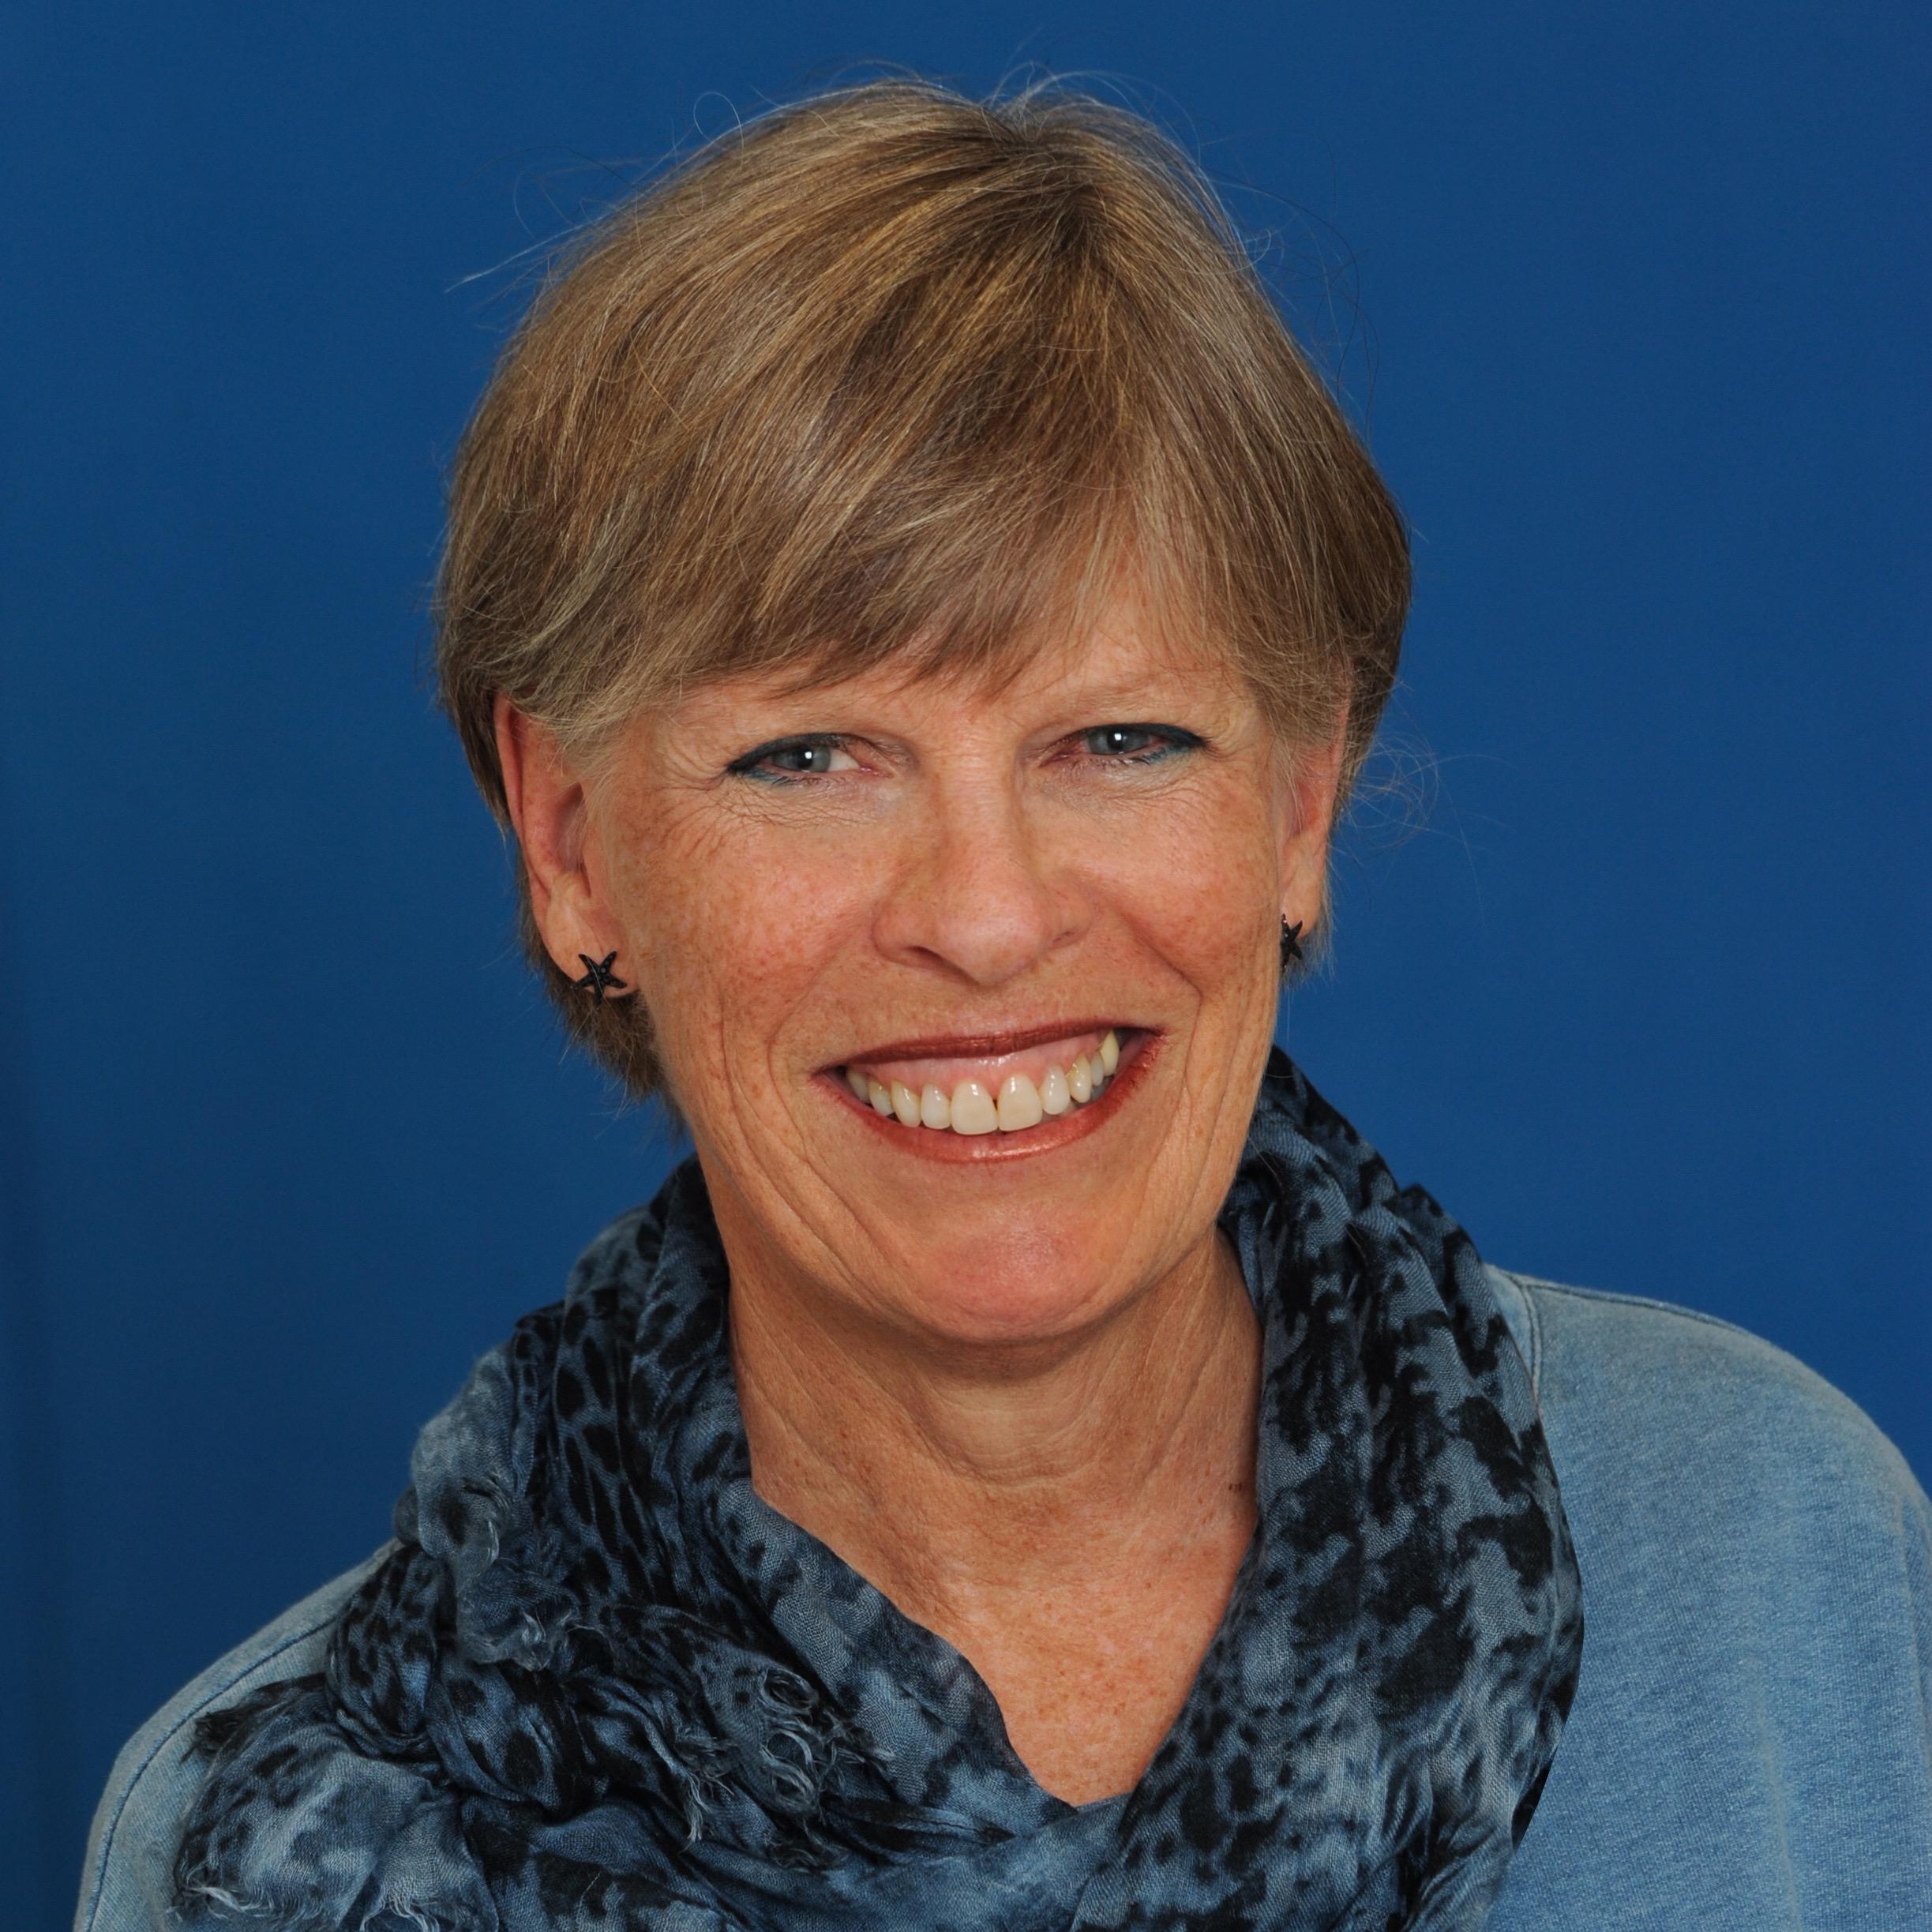 Alison Schoew